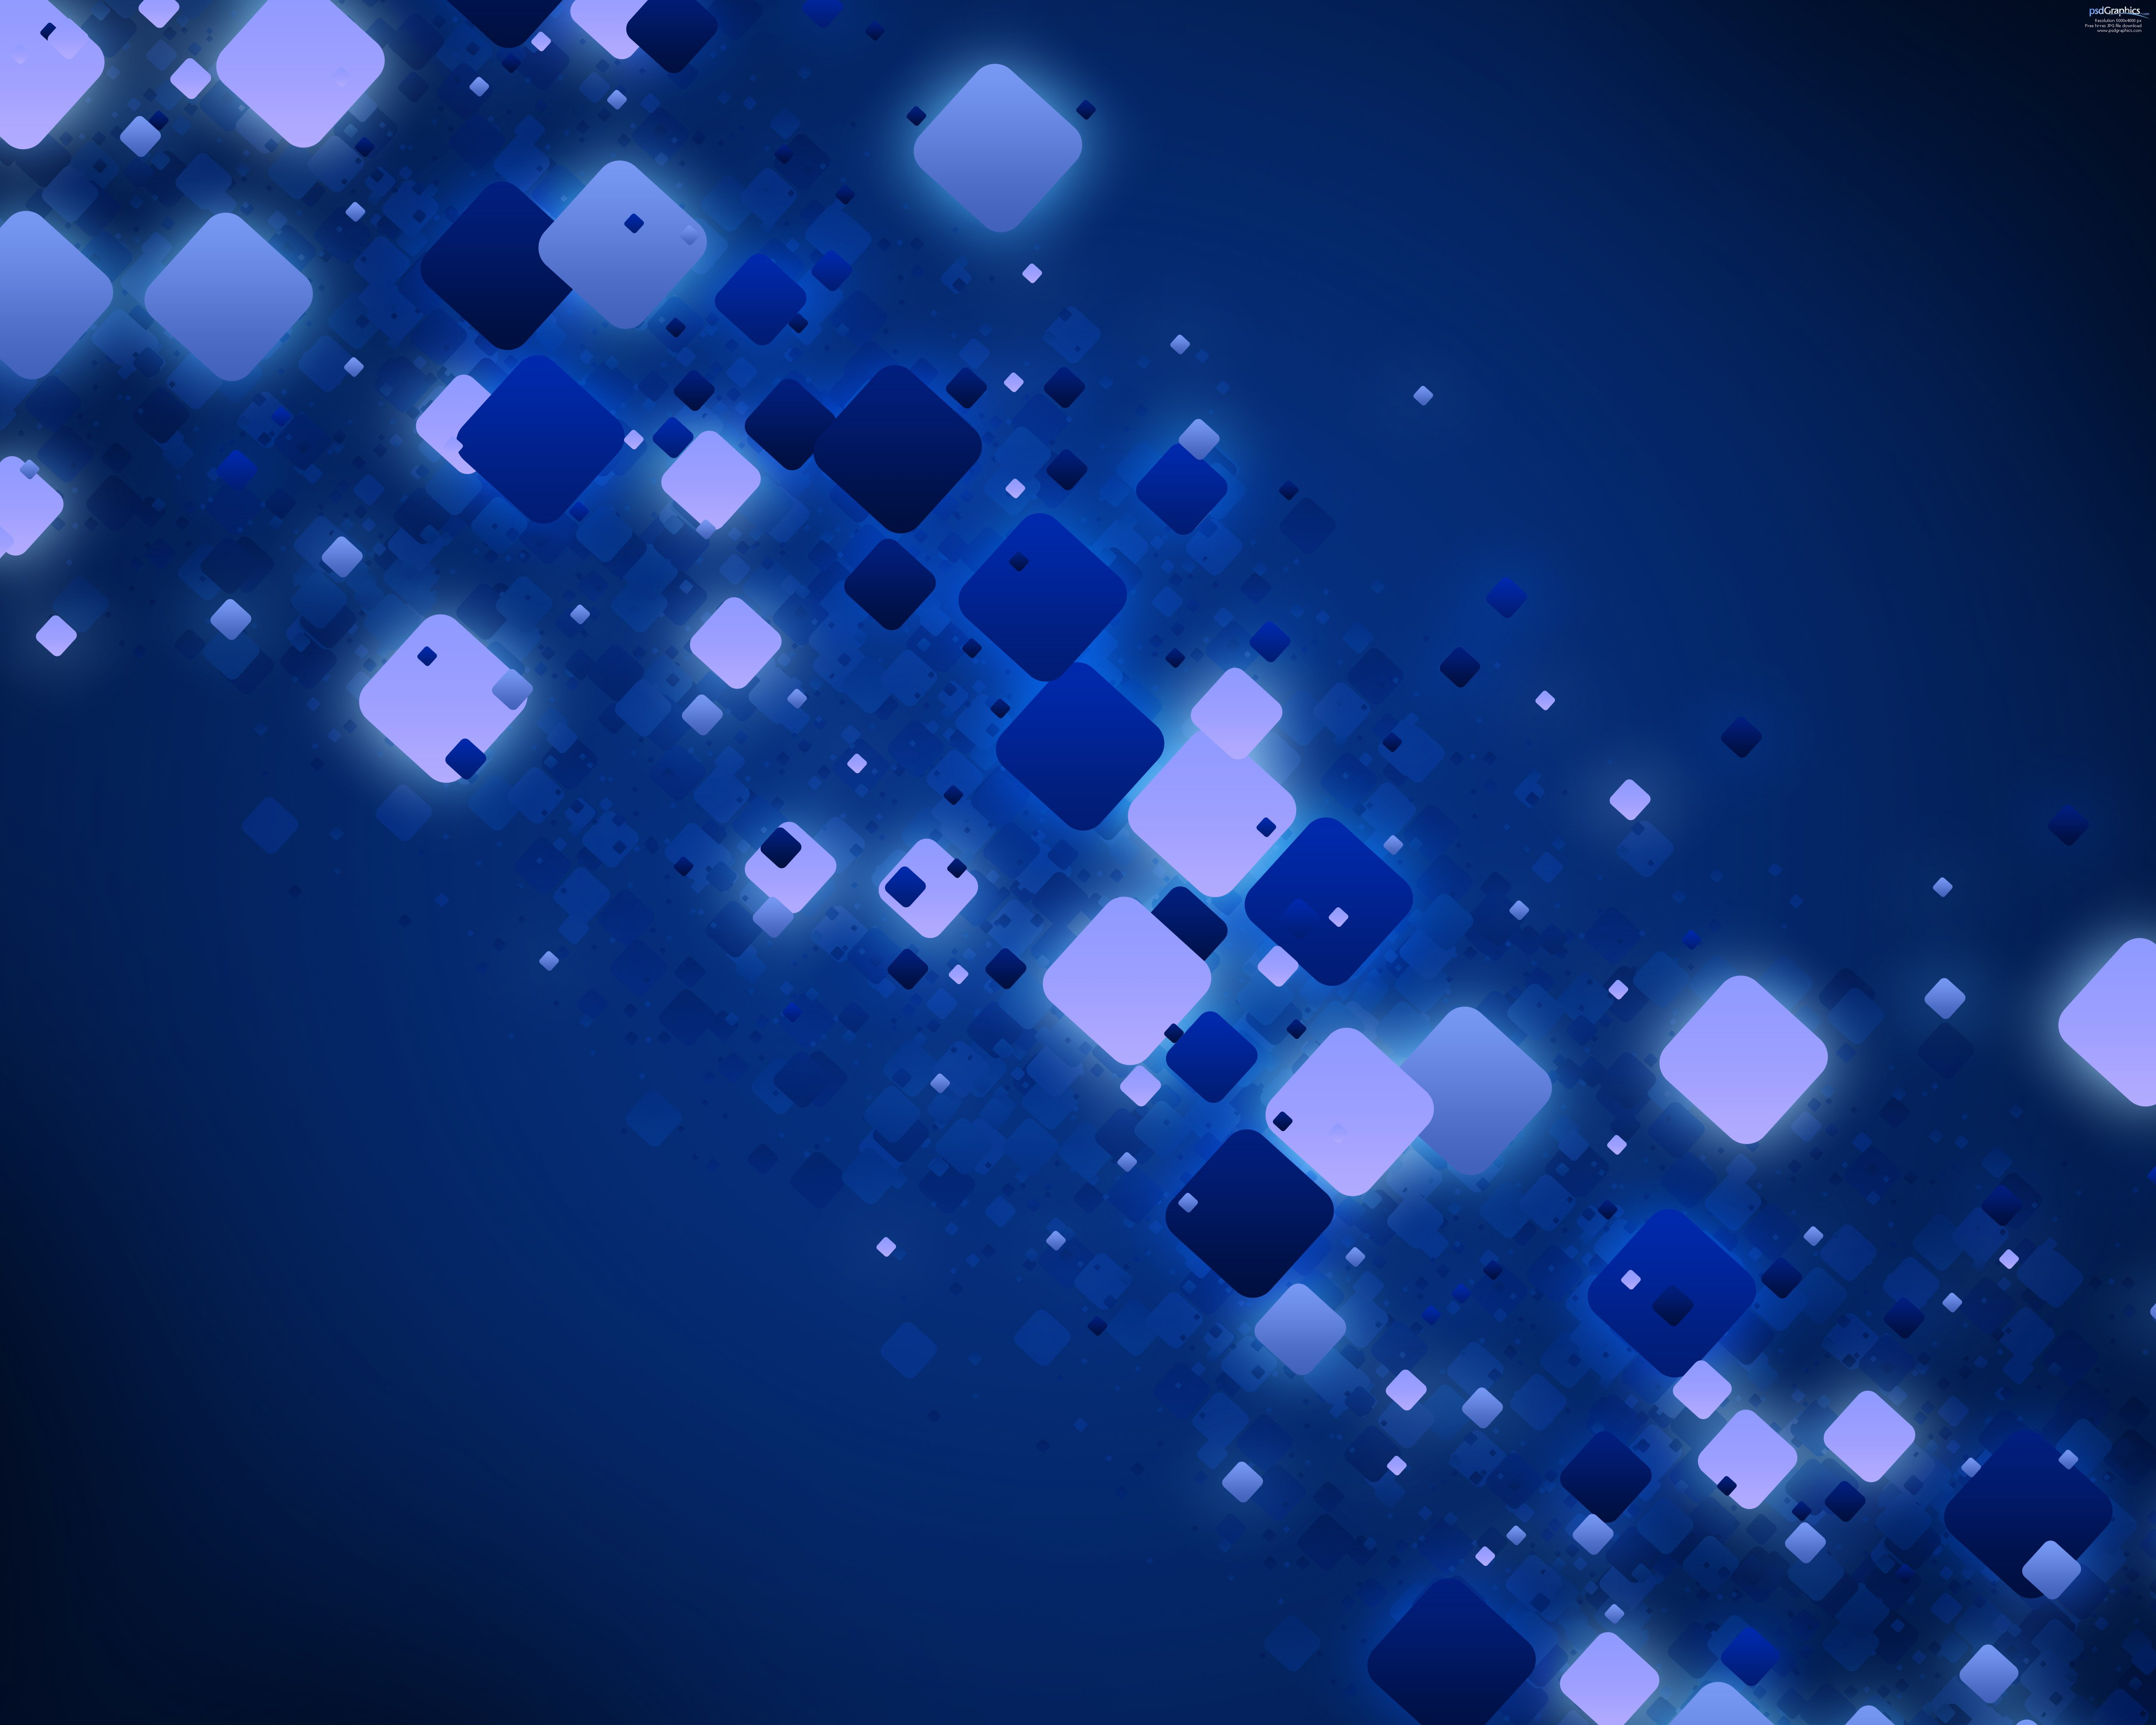 blue background 5000x4000